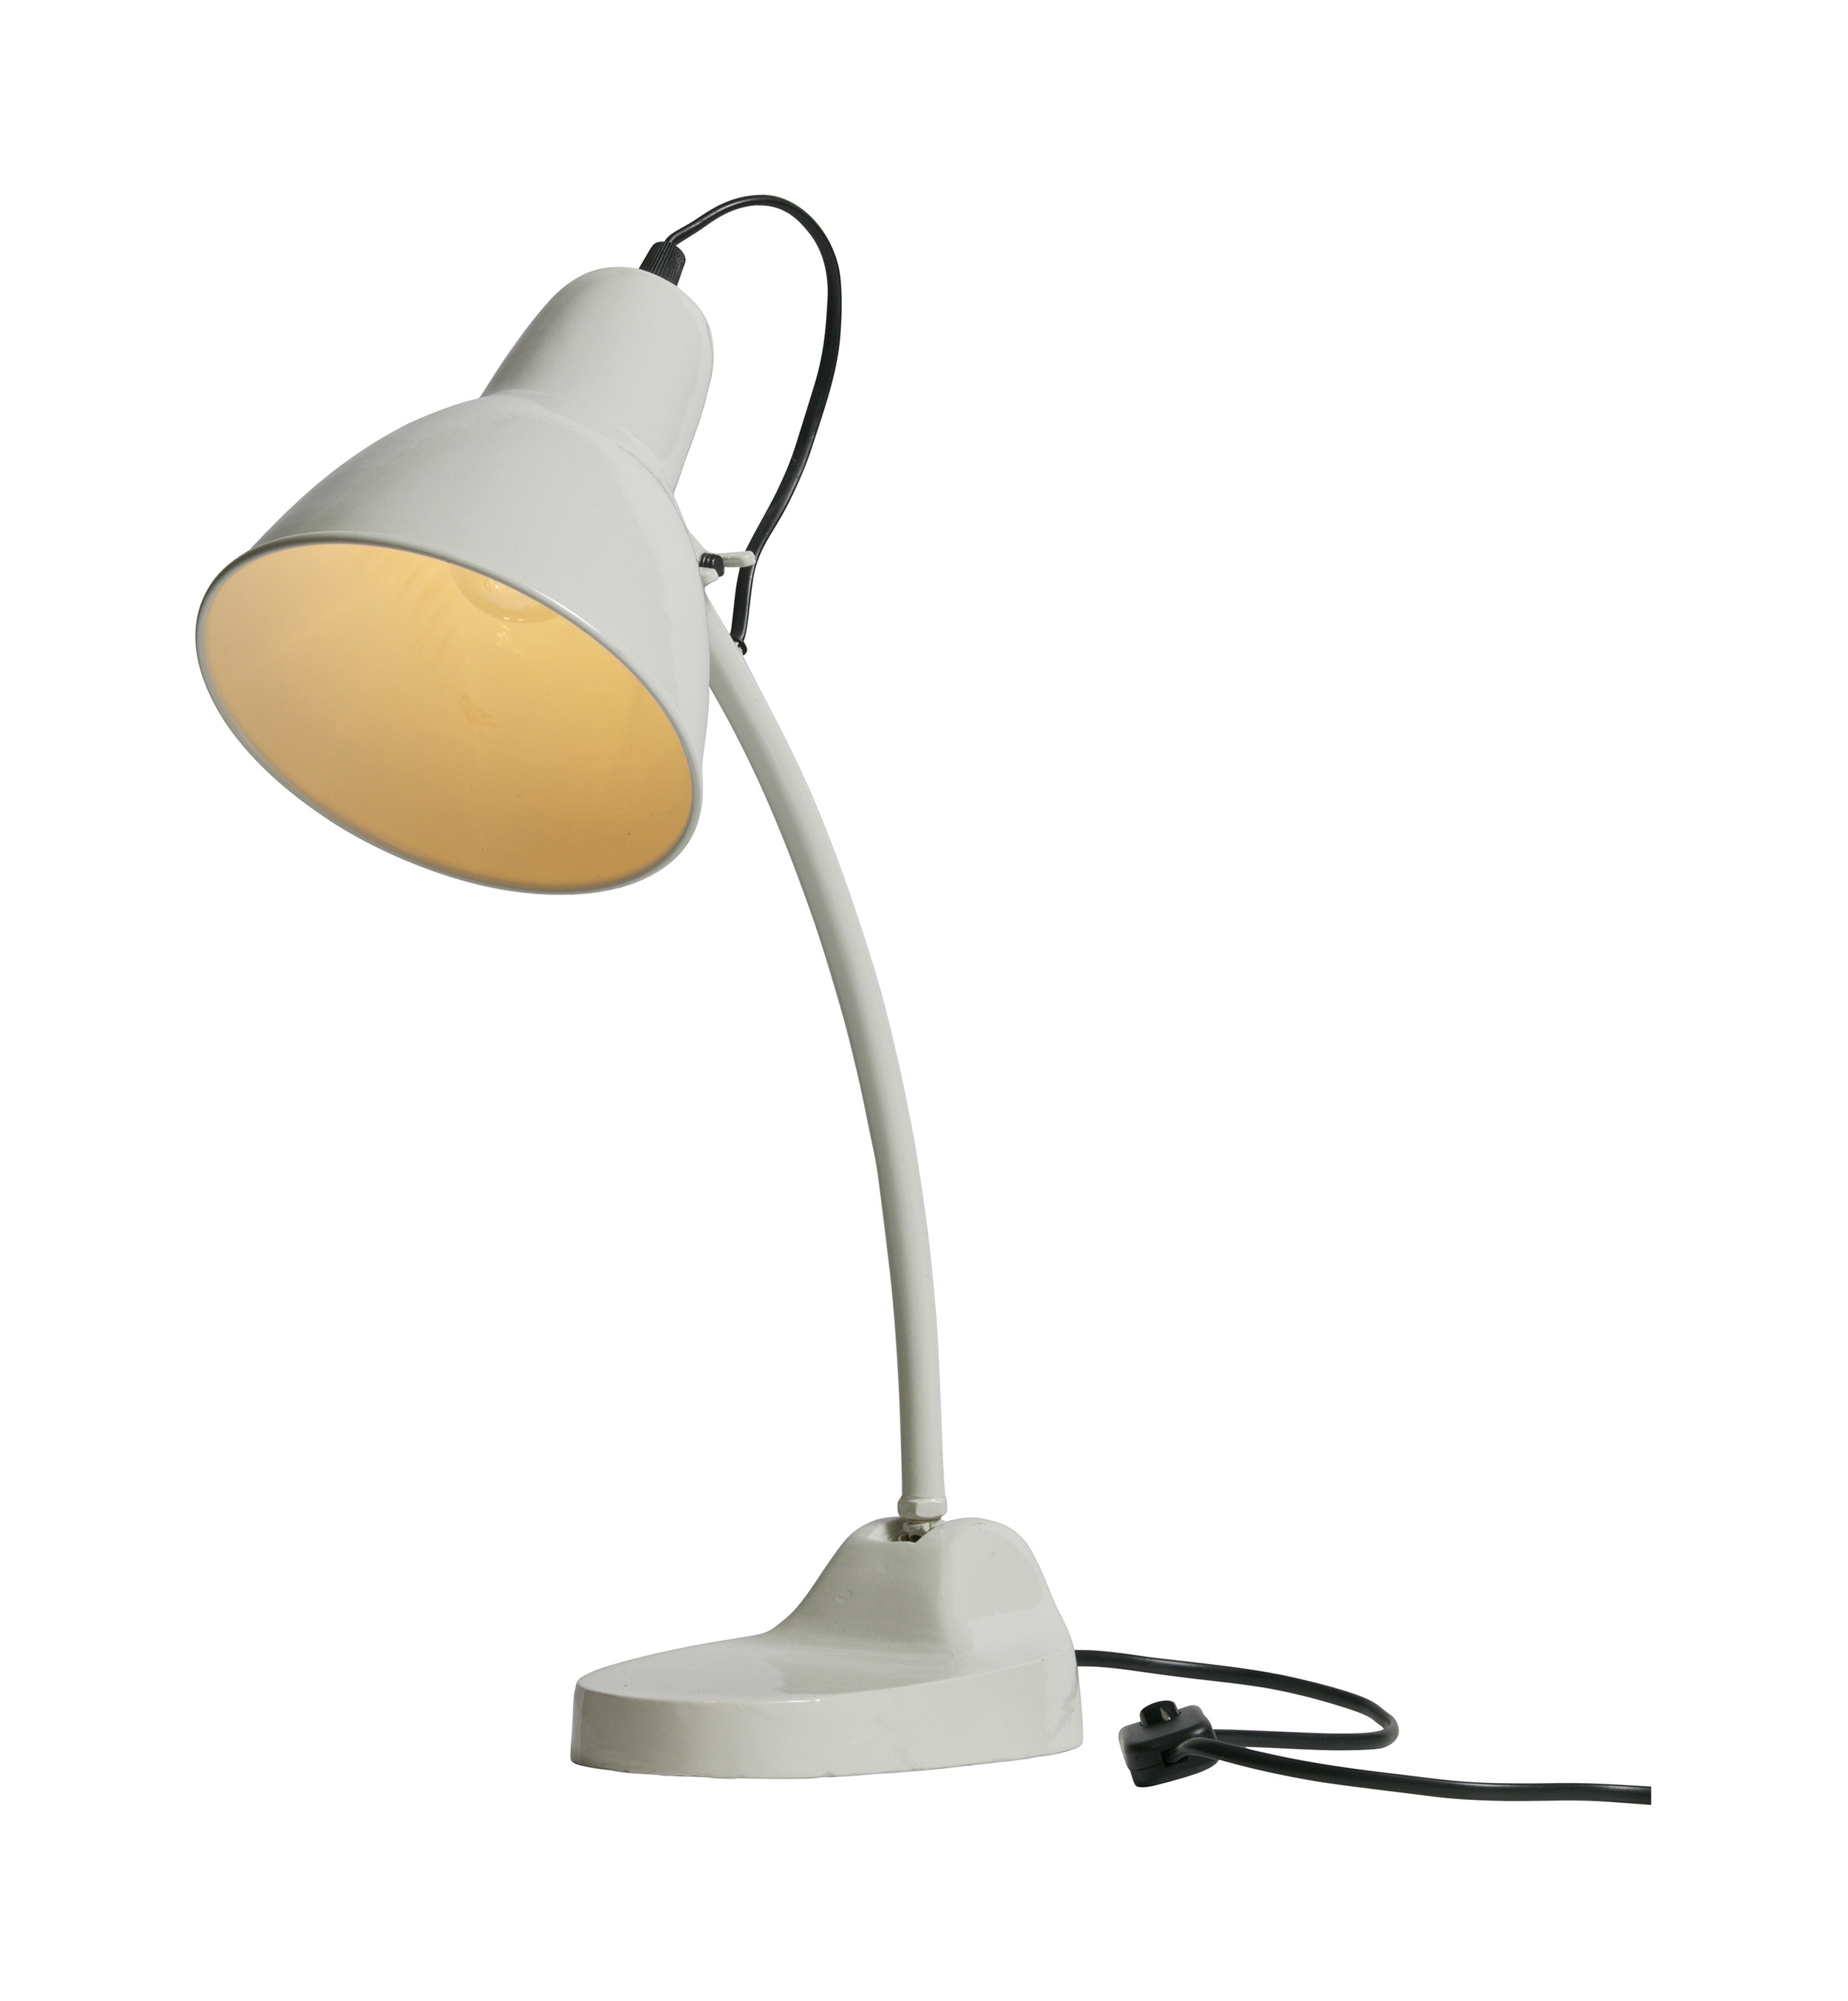 BePureHome Tafellamp 'Masterpiece', kleur Wit korting